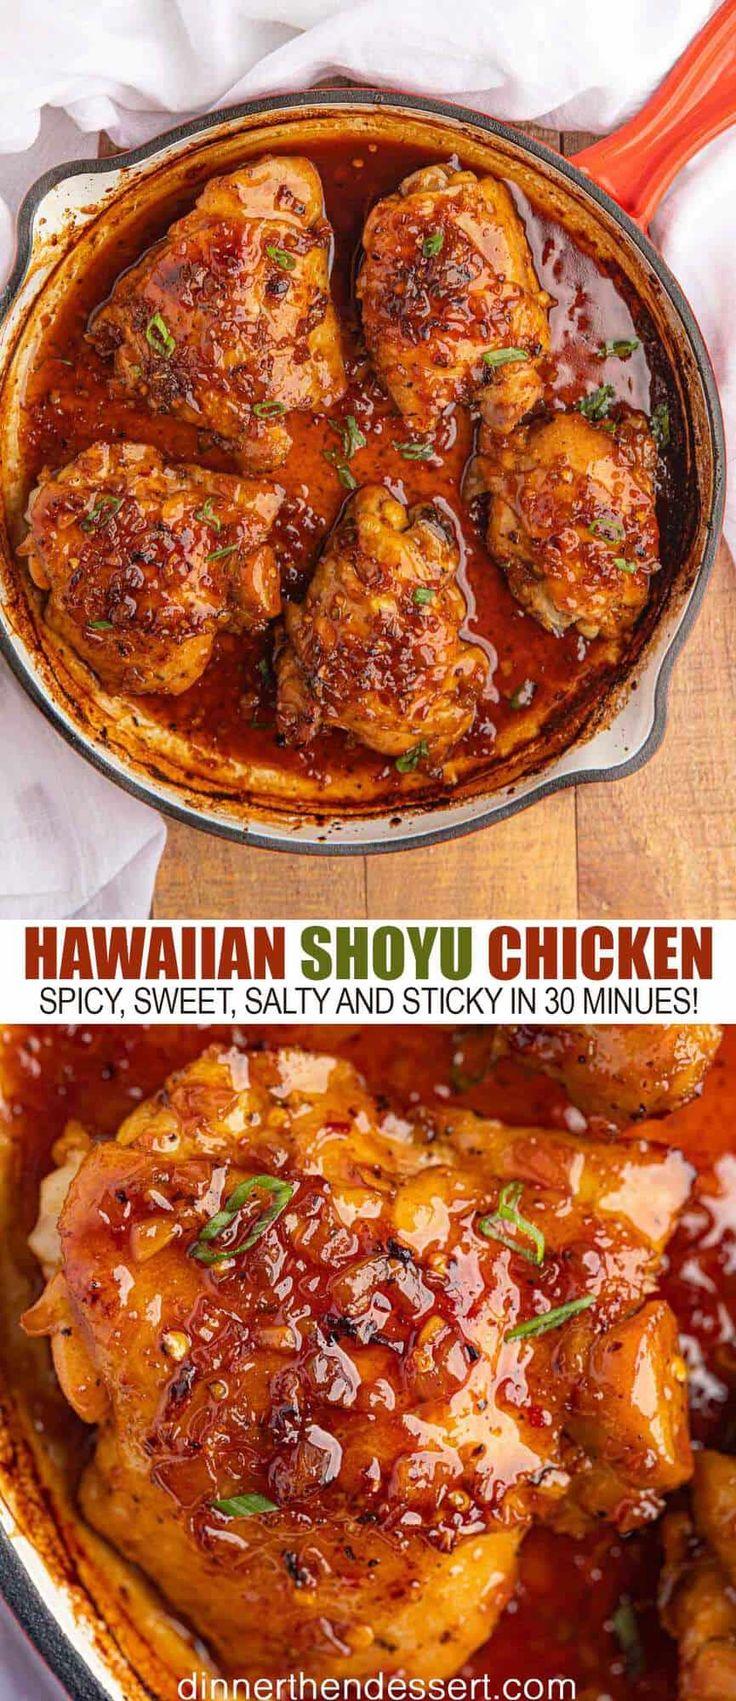 Hawaiian Shoyu Chicken is an easy chicken dish you'd get at a Hawaiian BBQ resta…